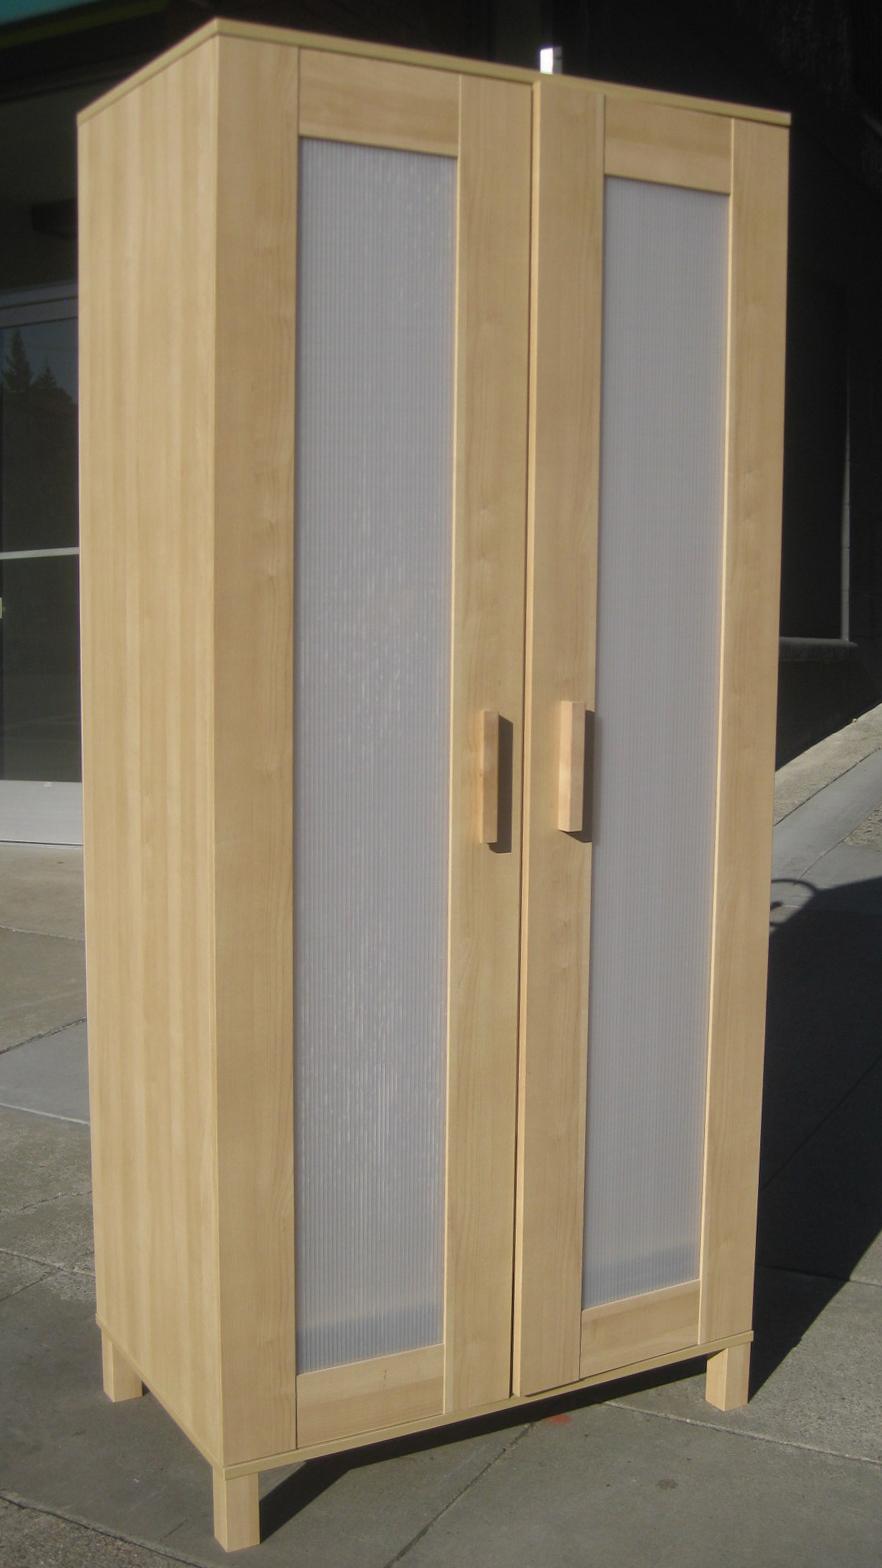 Uhuru Furniture Amp Collectibles Sold Ikea Closet 65